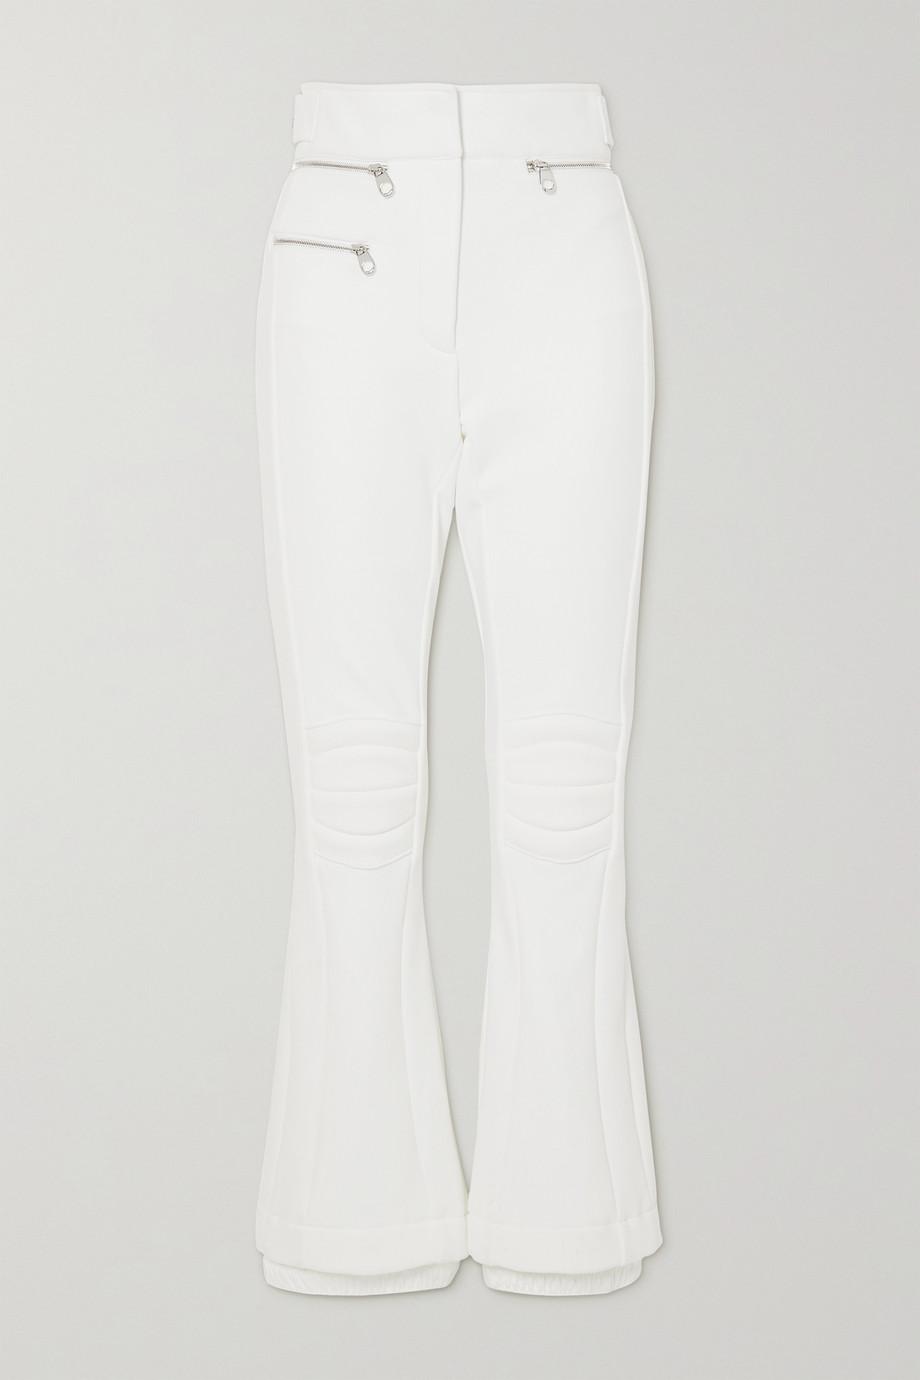 Chloé + Fusalp paneled bootcut ski pants